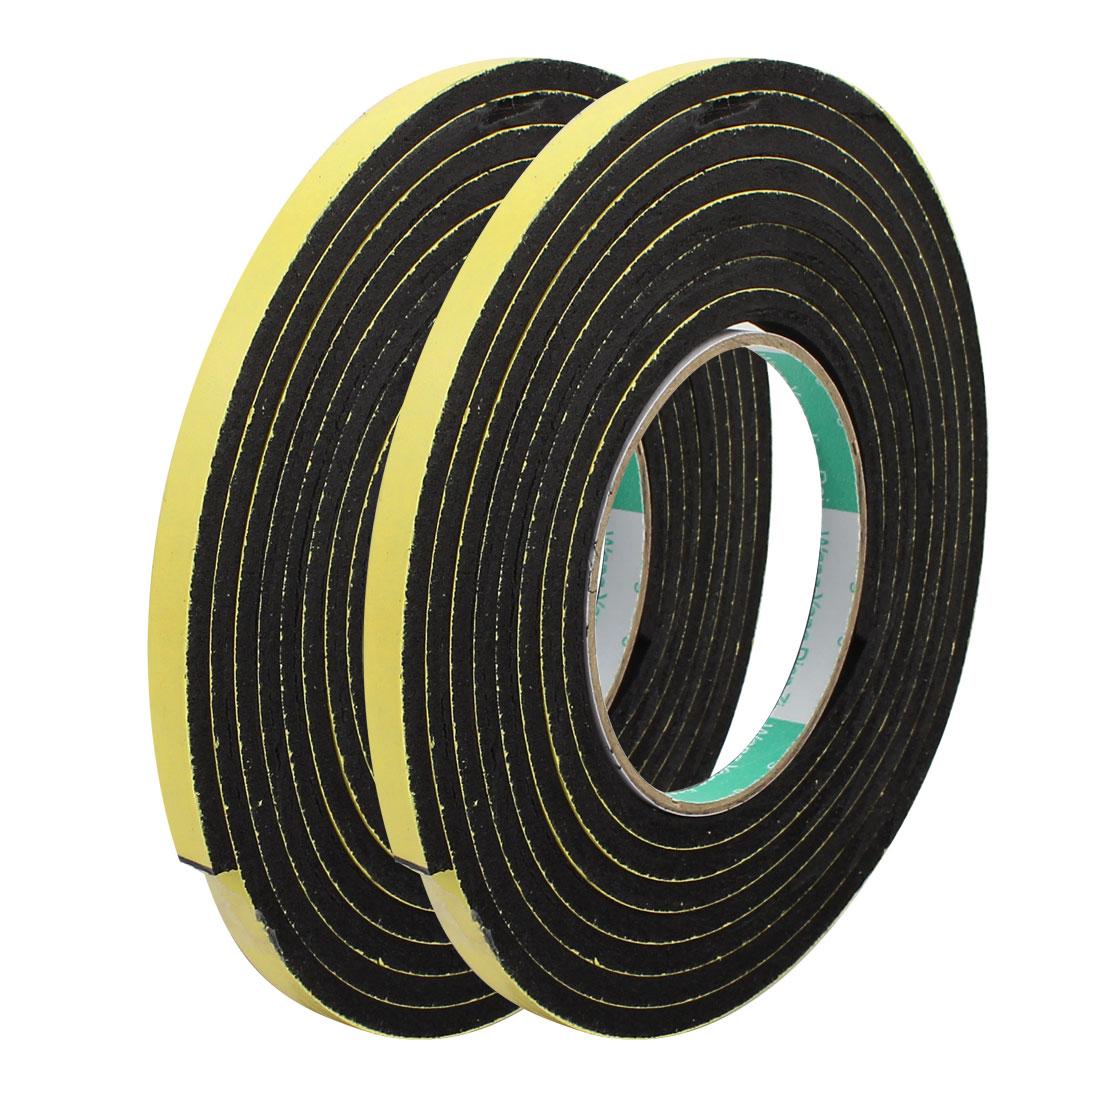 2pcs 3Meter 8mm x 5mm Single-side Adhesive Shockproof Sponge Foam Tape Yellow